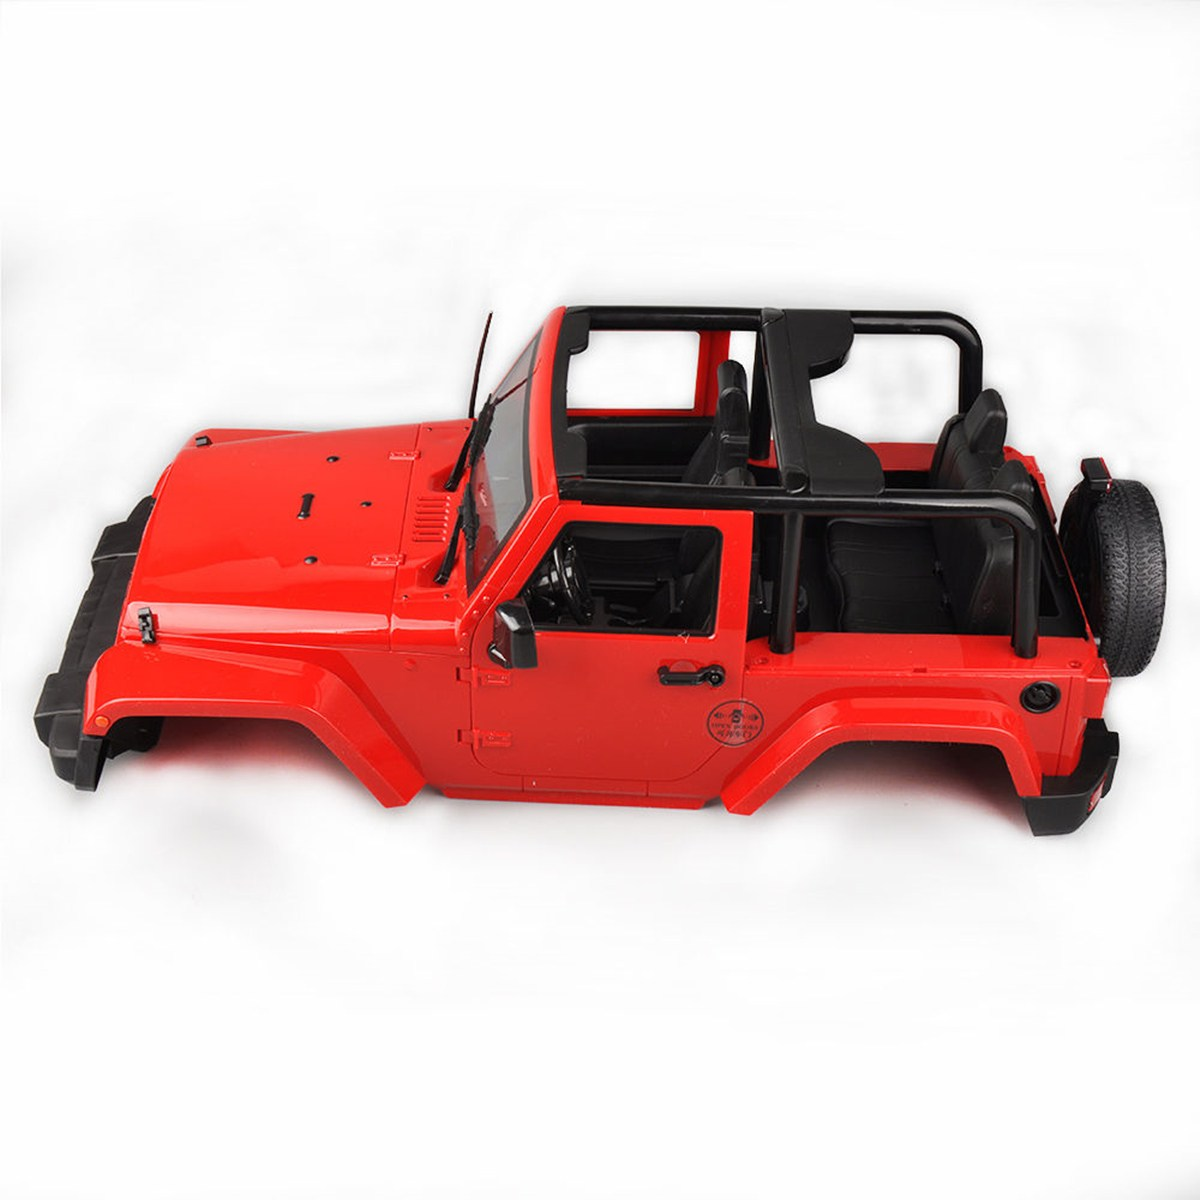 Hard Body Shell Canopy J eep RC 1/10 SCX10/D90 Rock CRAWLER Truck Red<br>